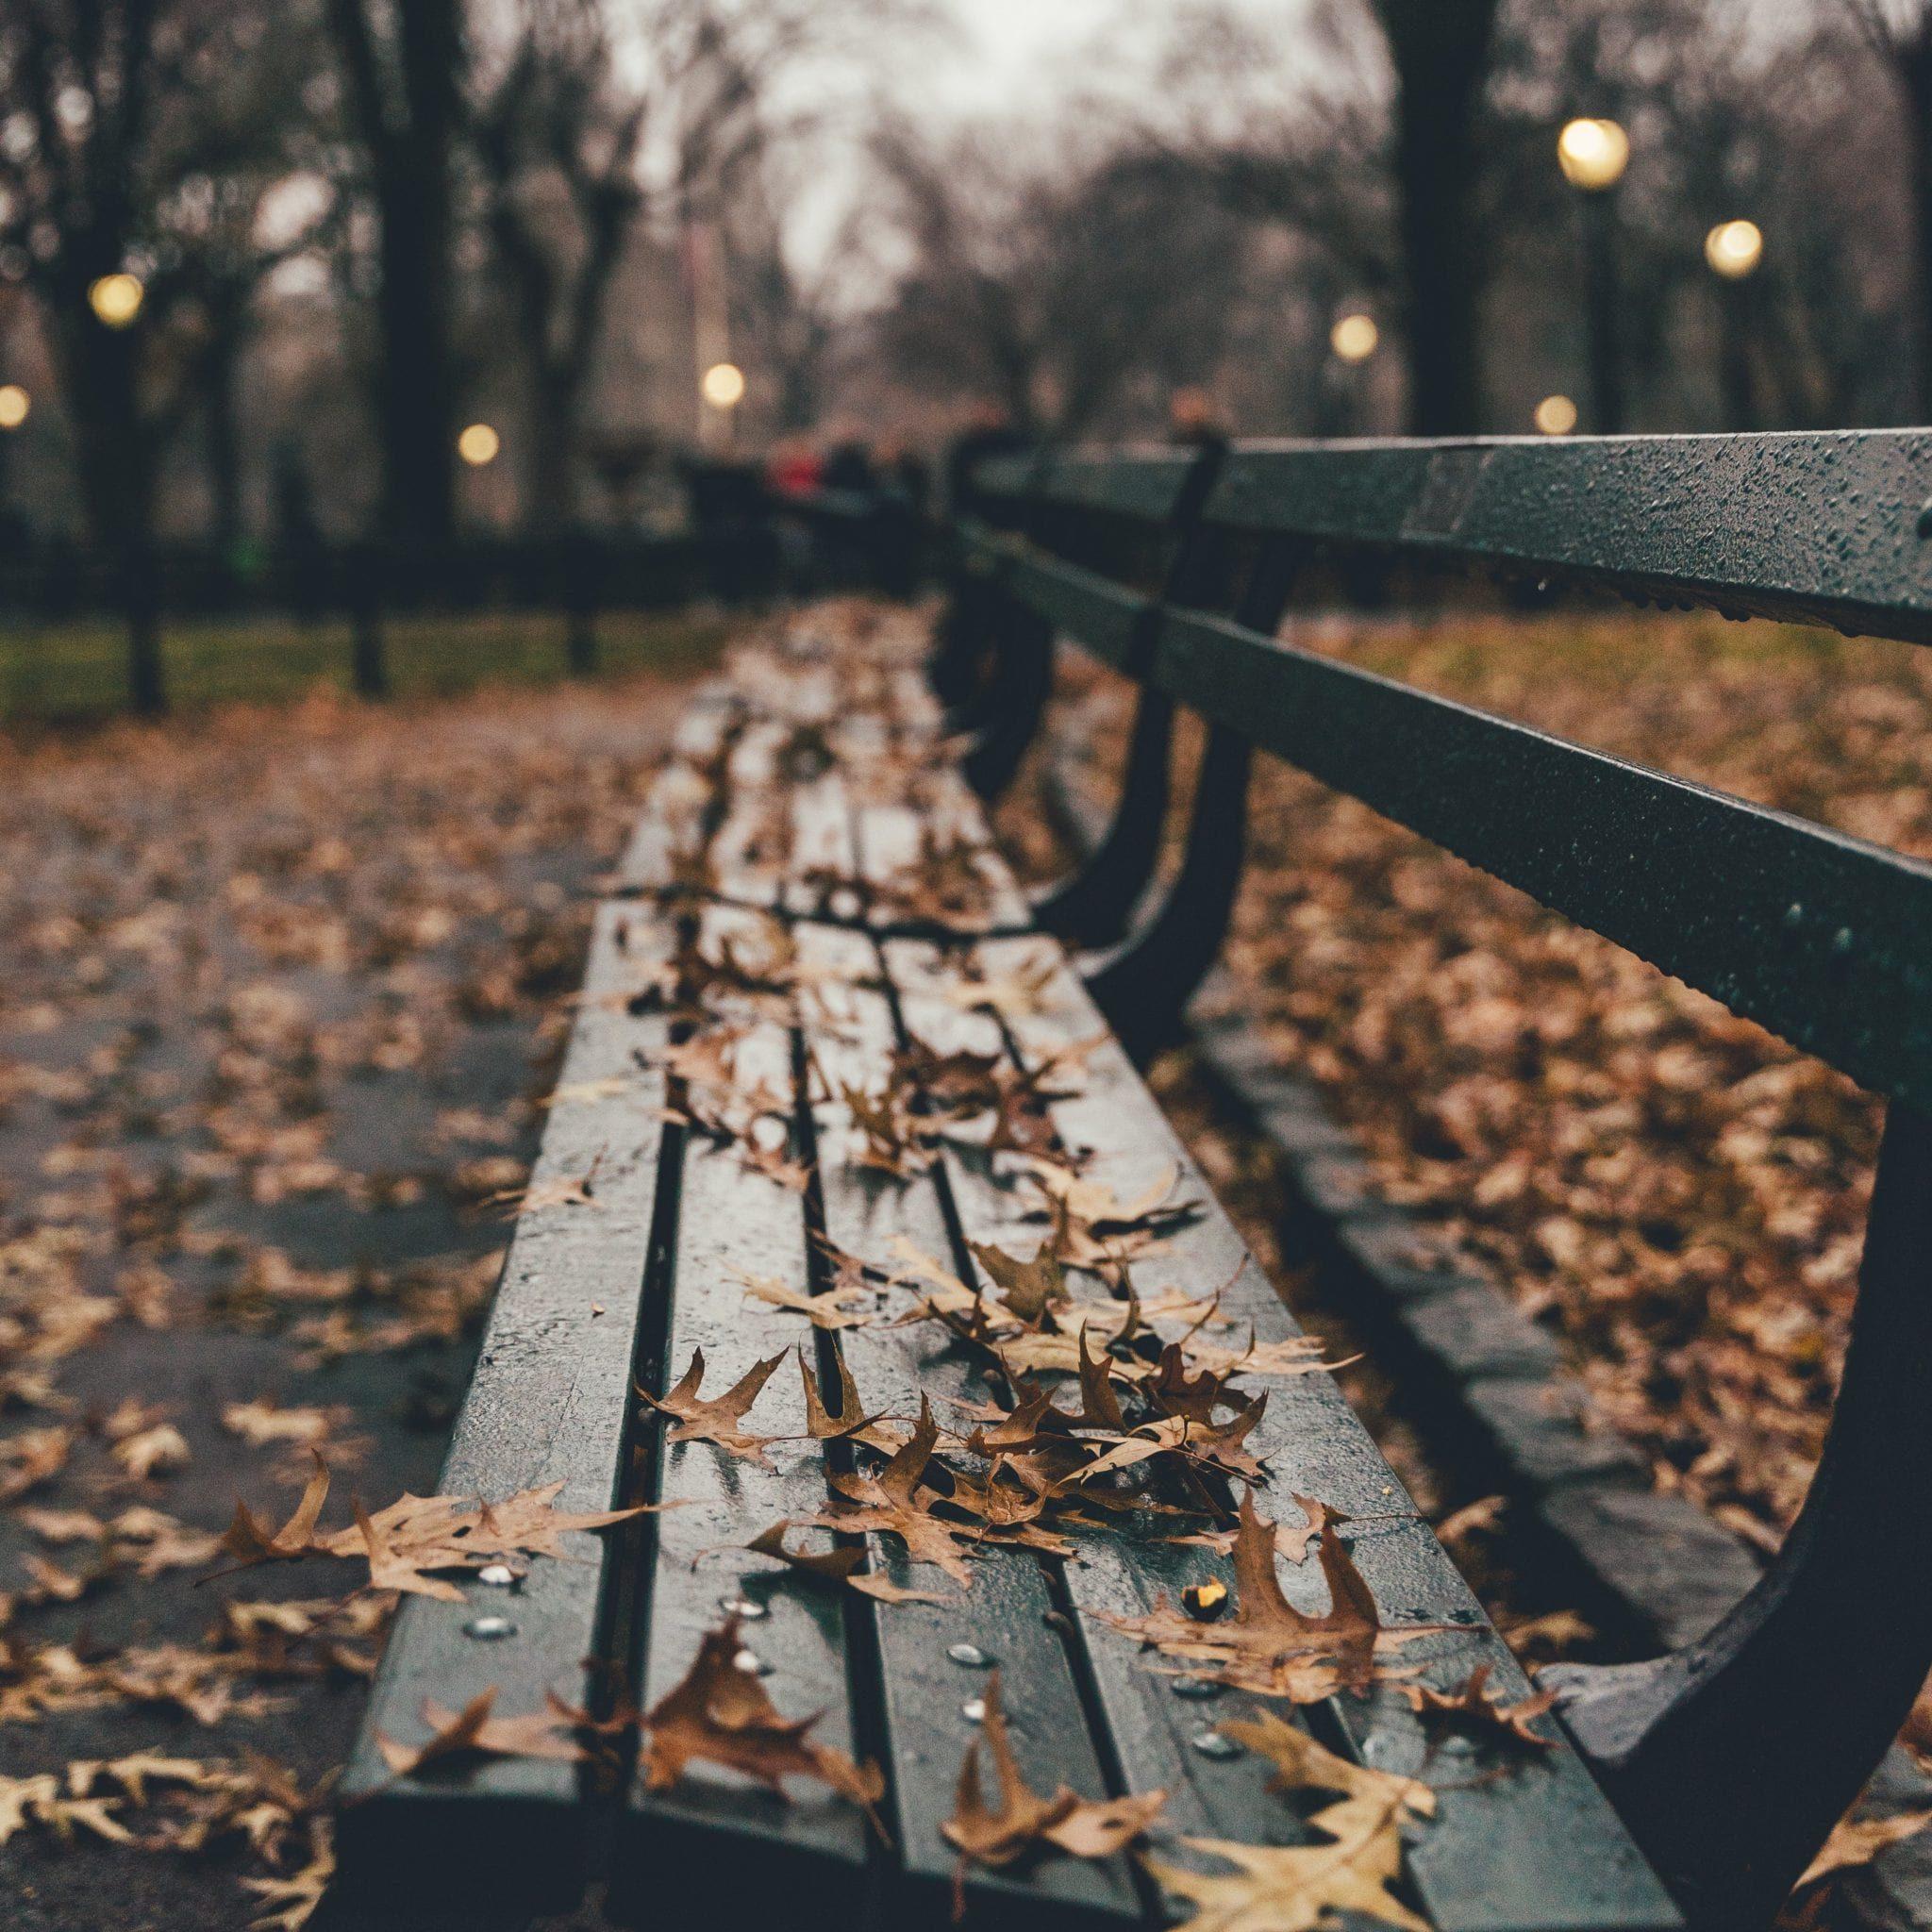 bench - nicole-y-c-pTBD5klYw3Y-unsplash - square